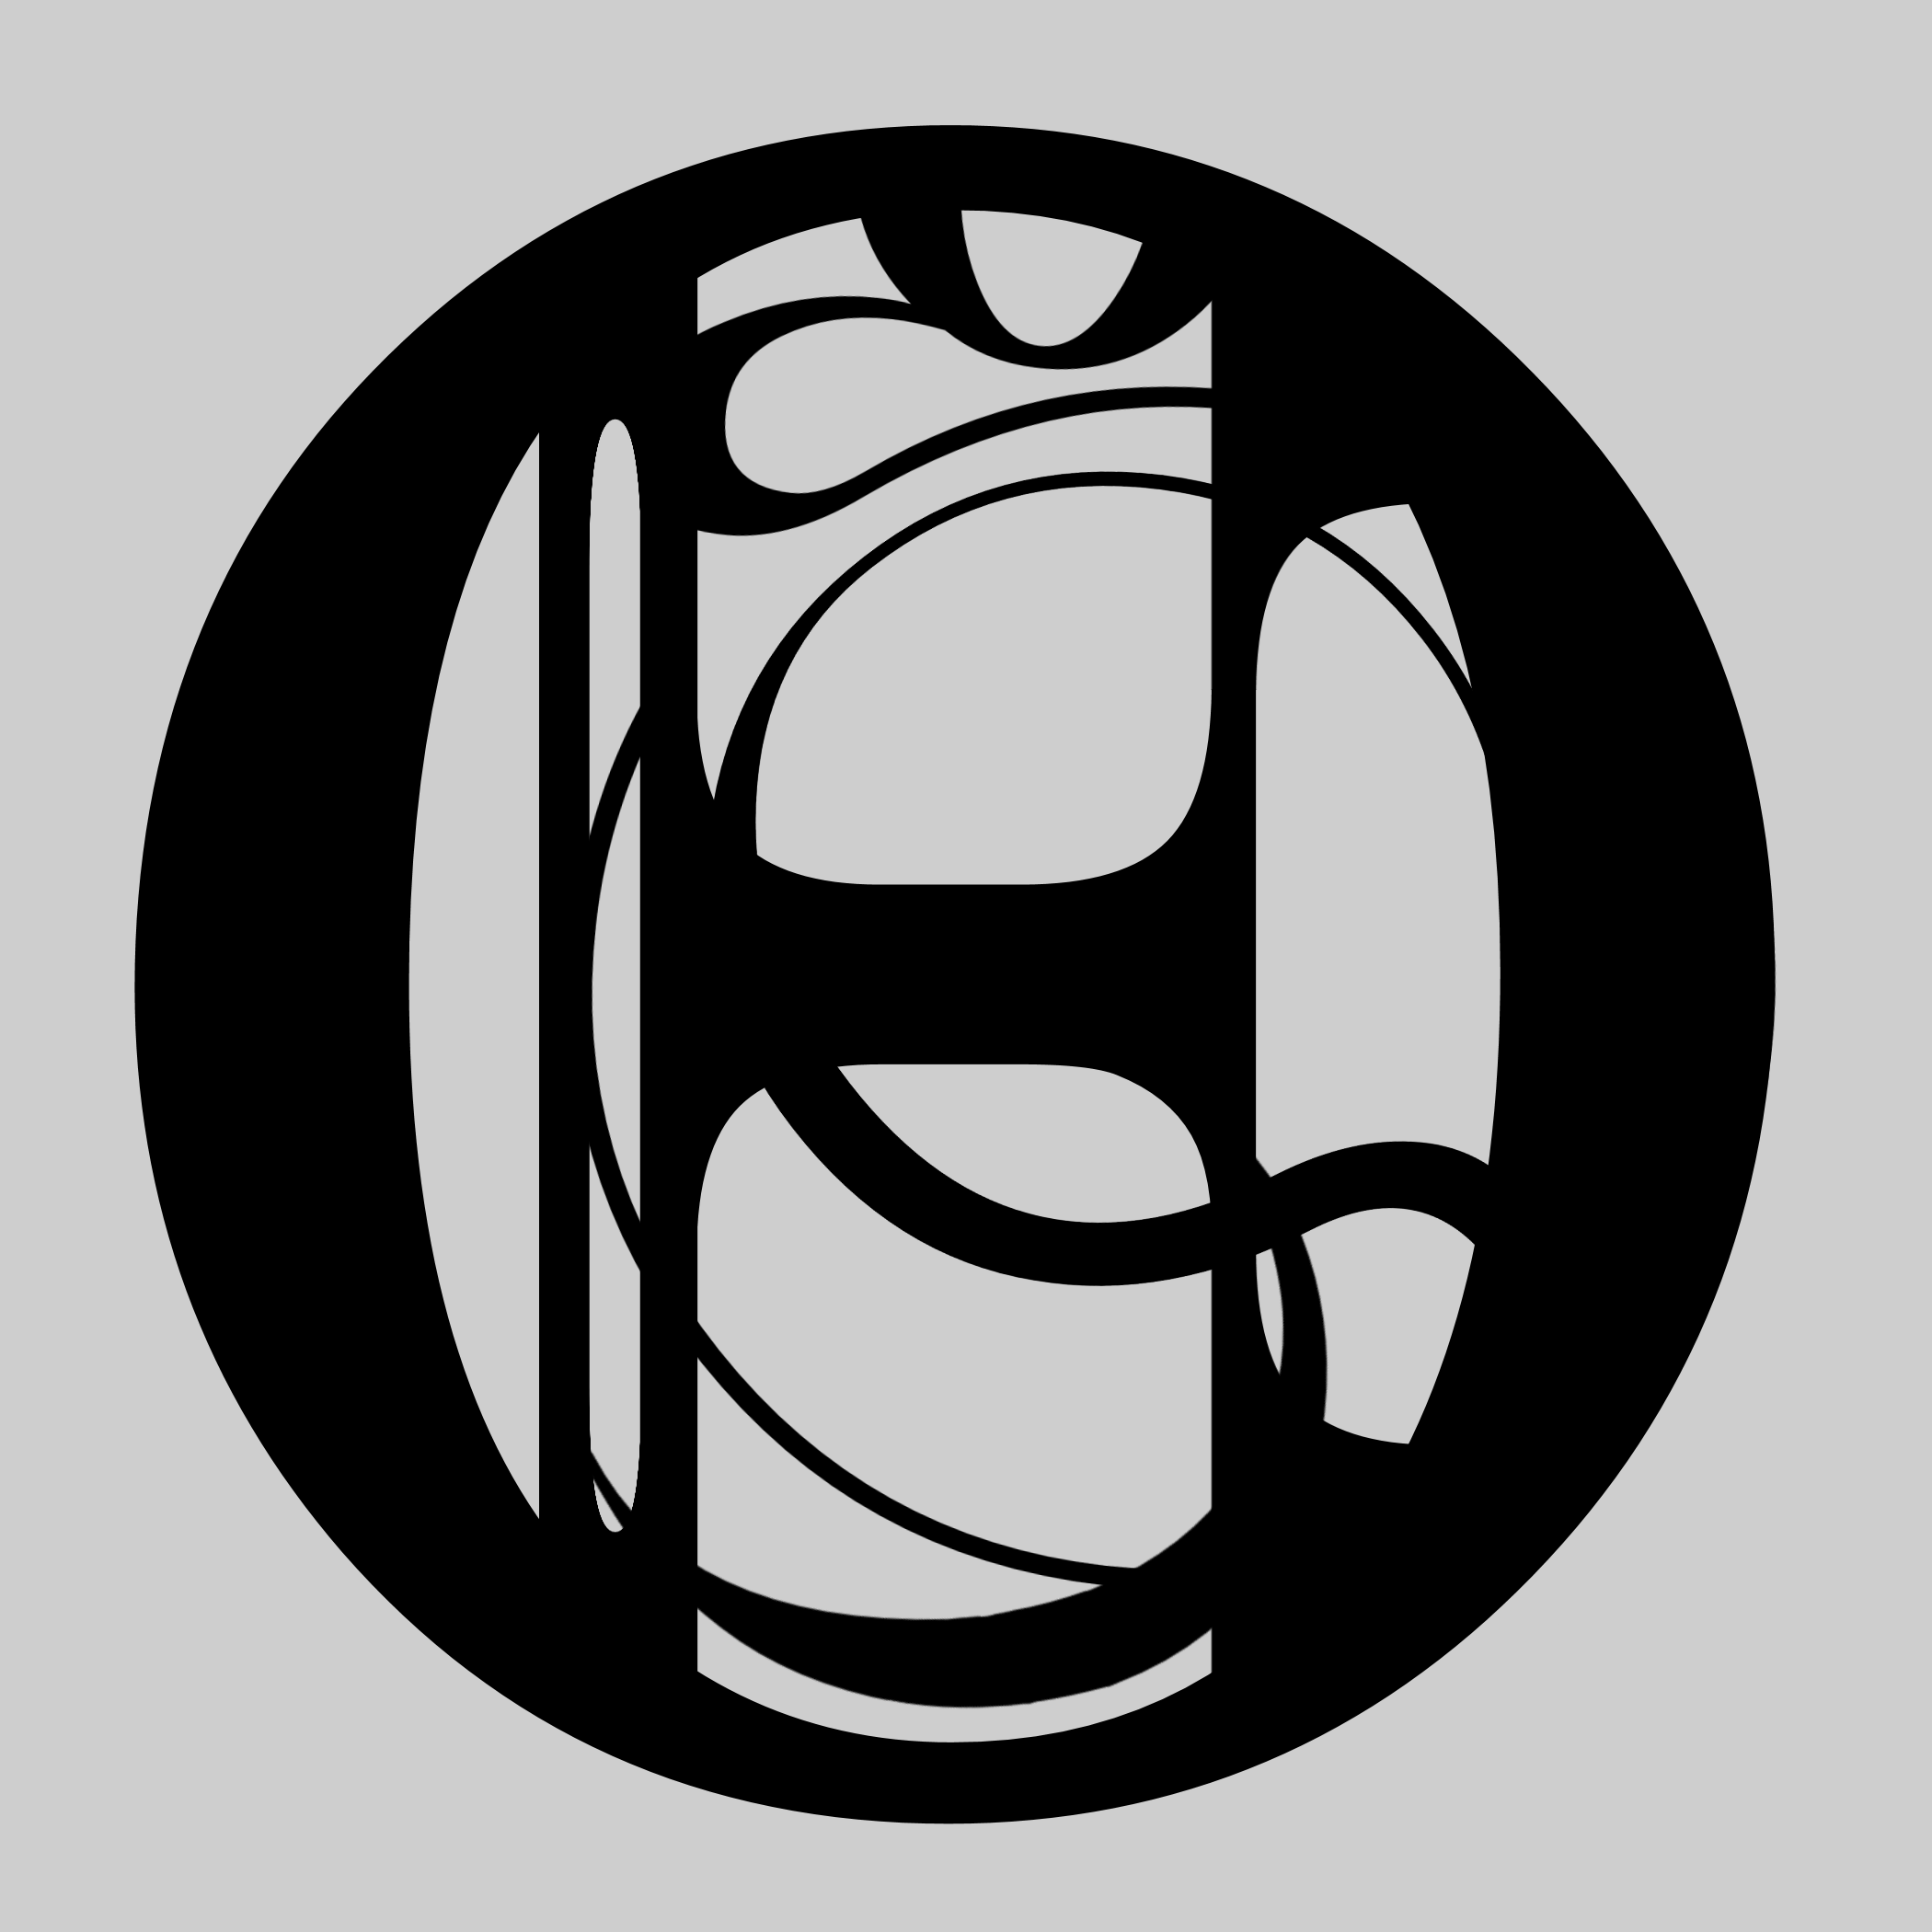 Theta - Font Study